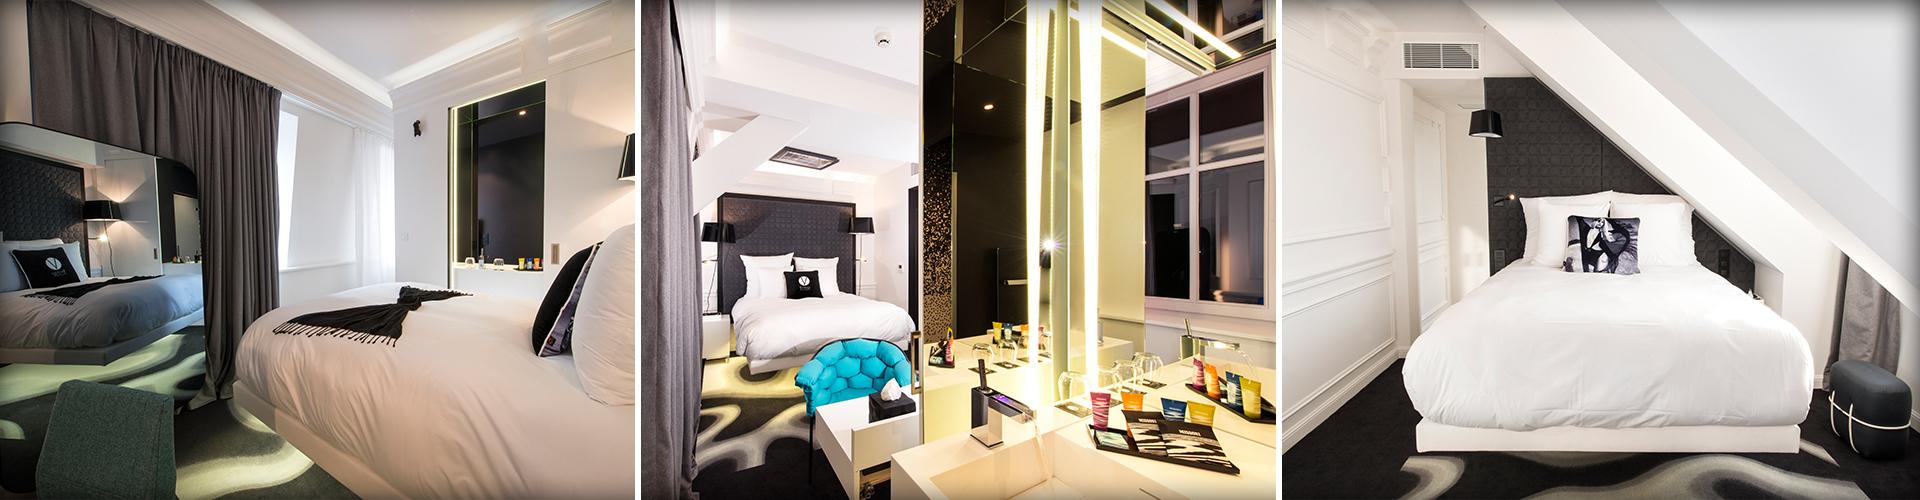 vertigo h tel spa dijon sleep. Black Bedroom Furniture Sets. Home Design Ideas